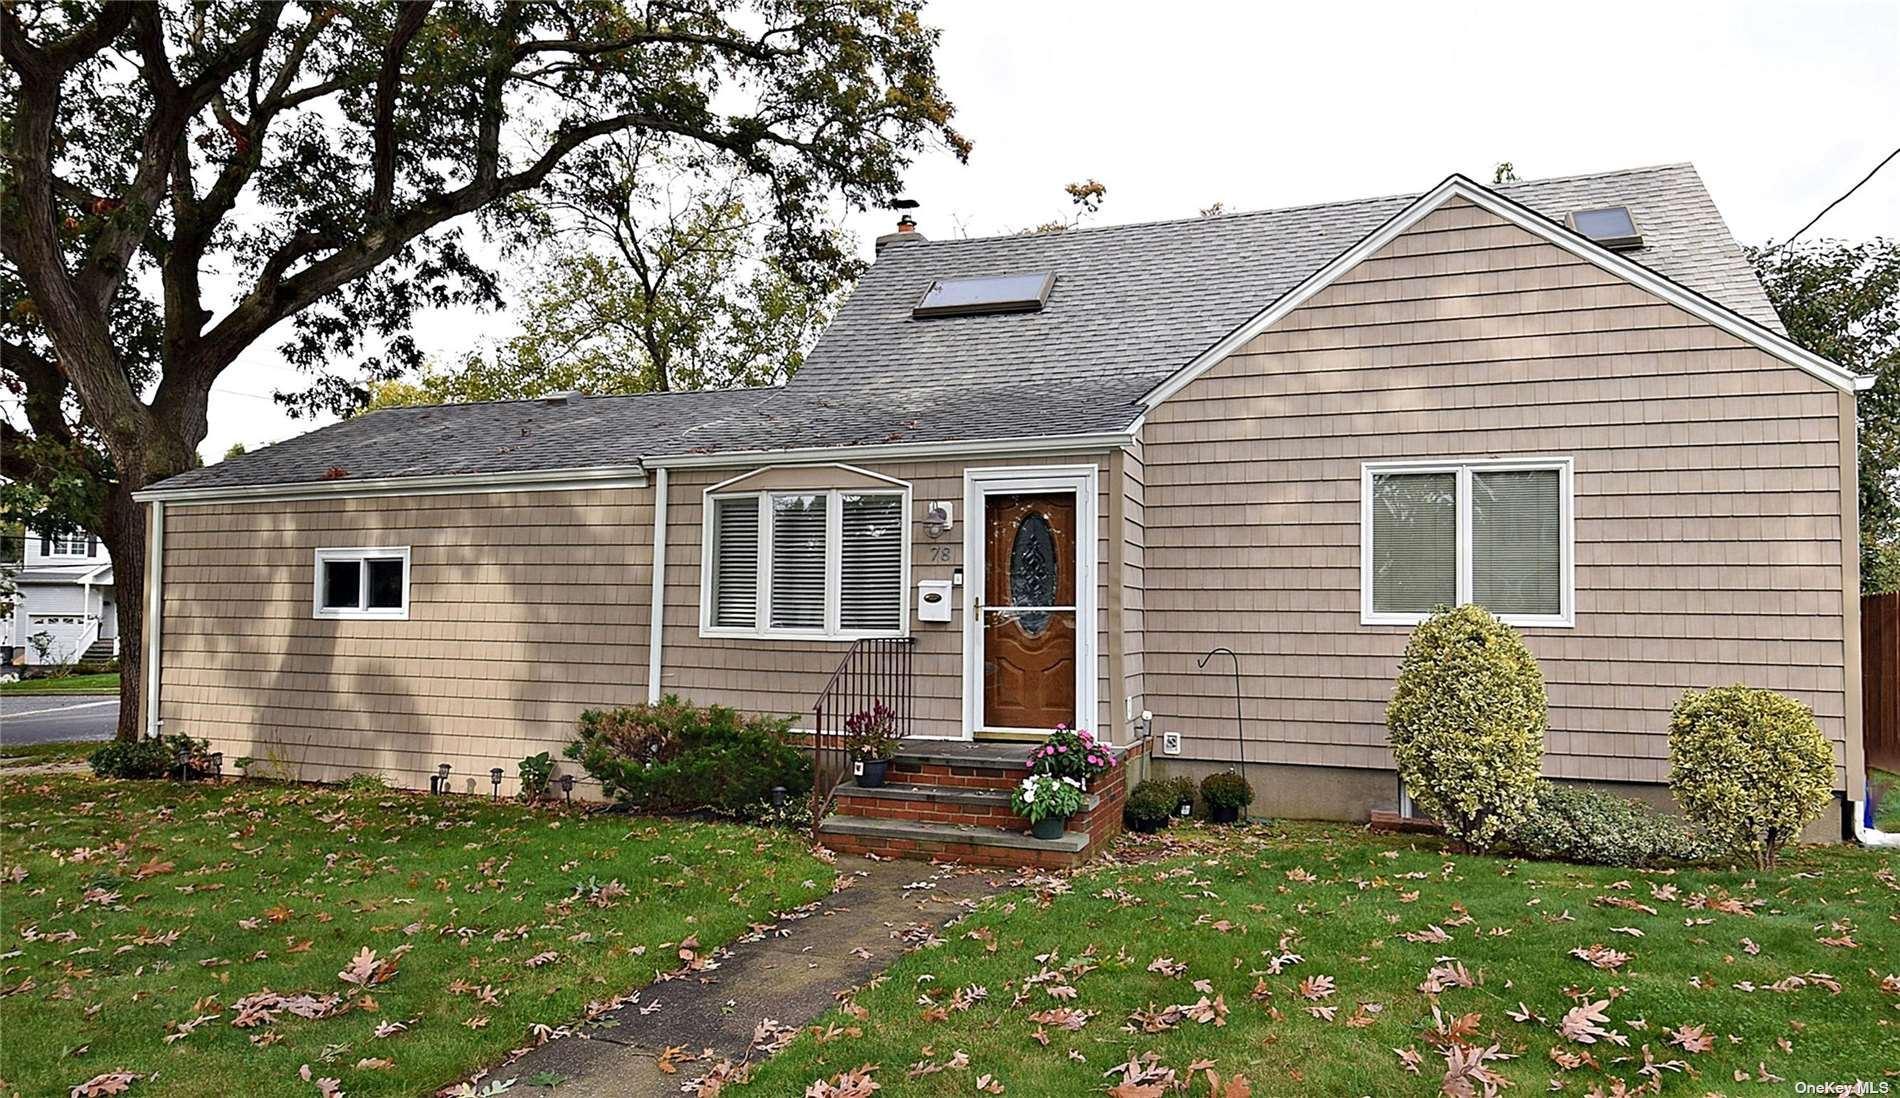 78 Walnut Avenue, Farmingdale, NY 11735 - MLS#: 3352960